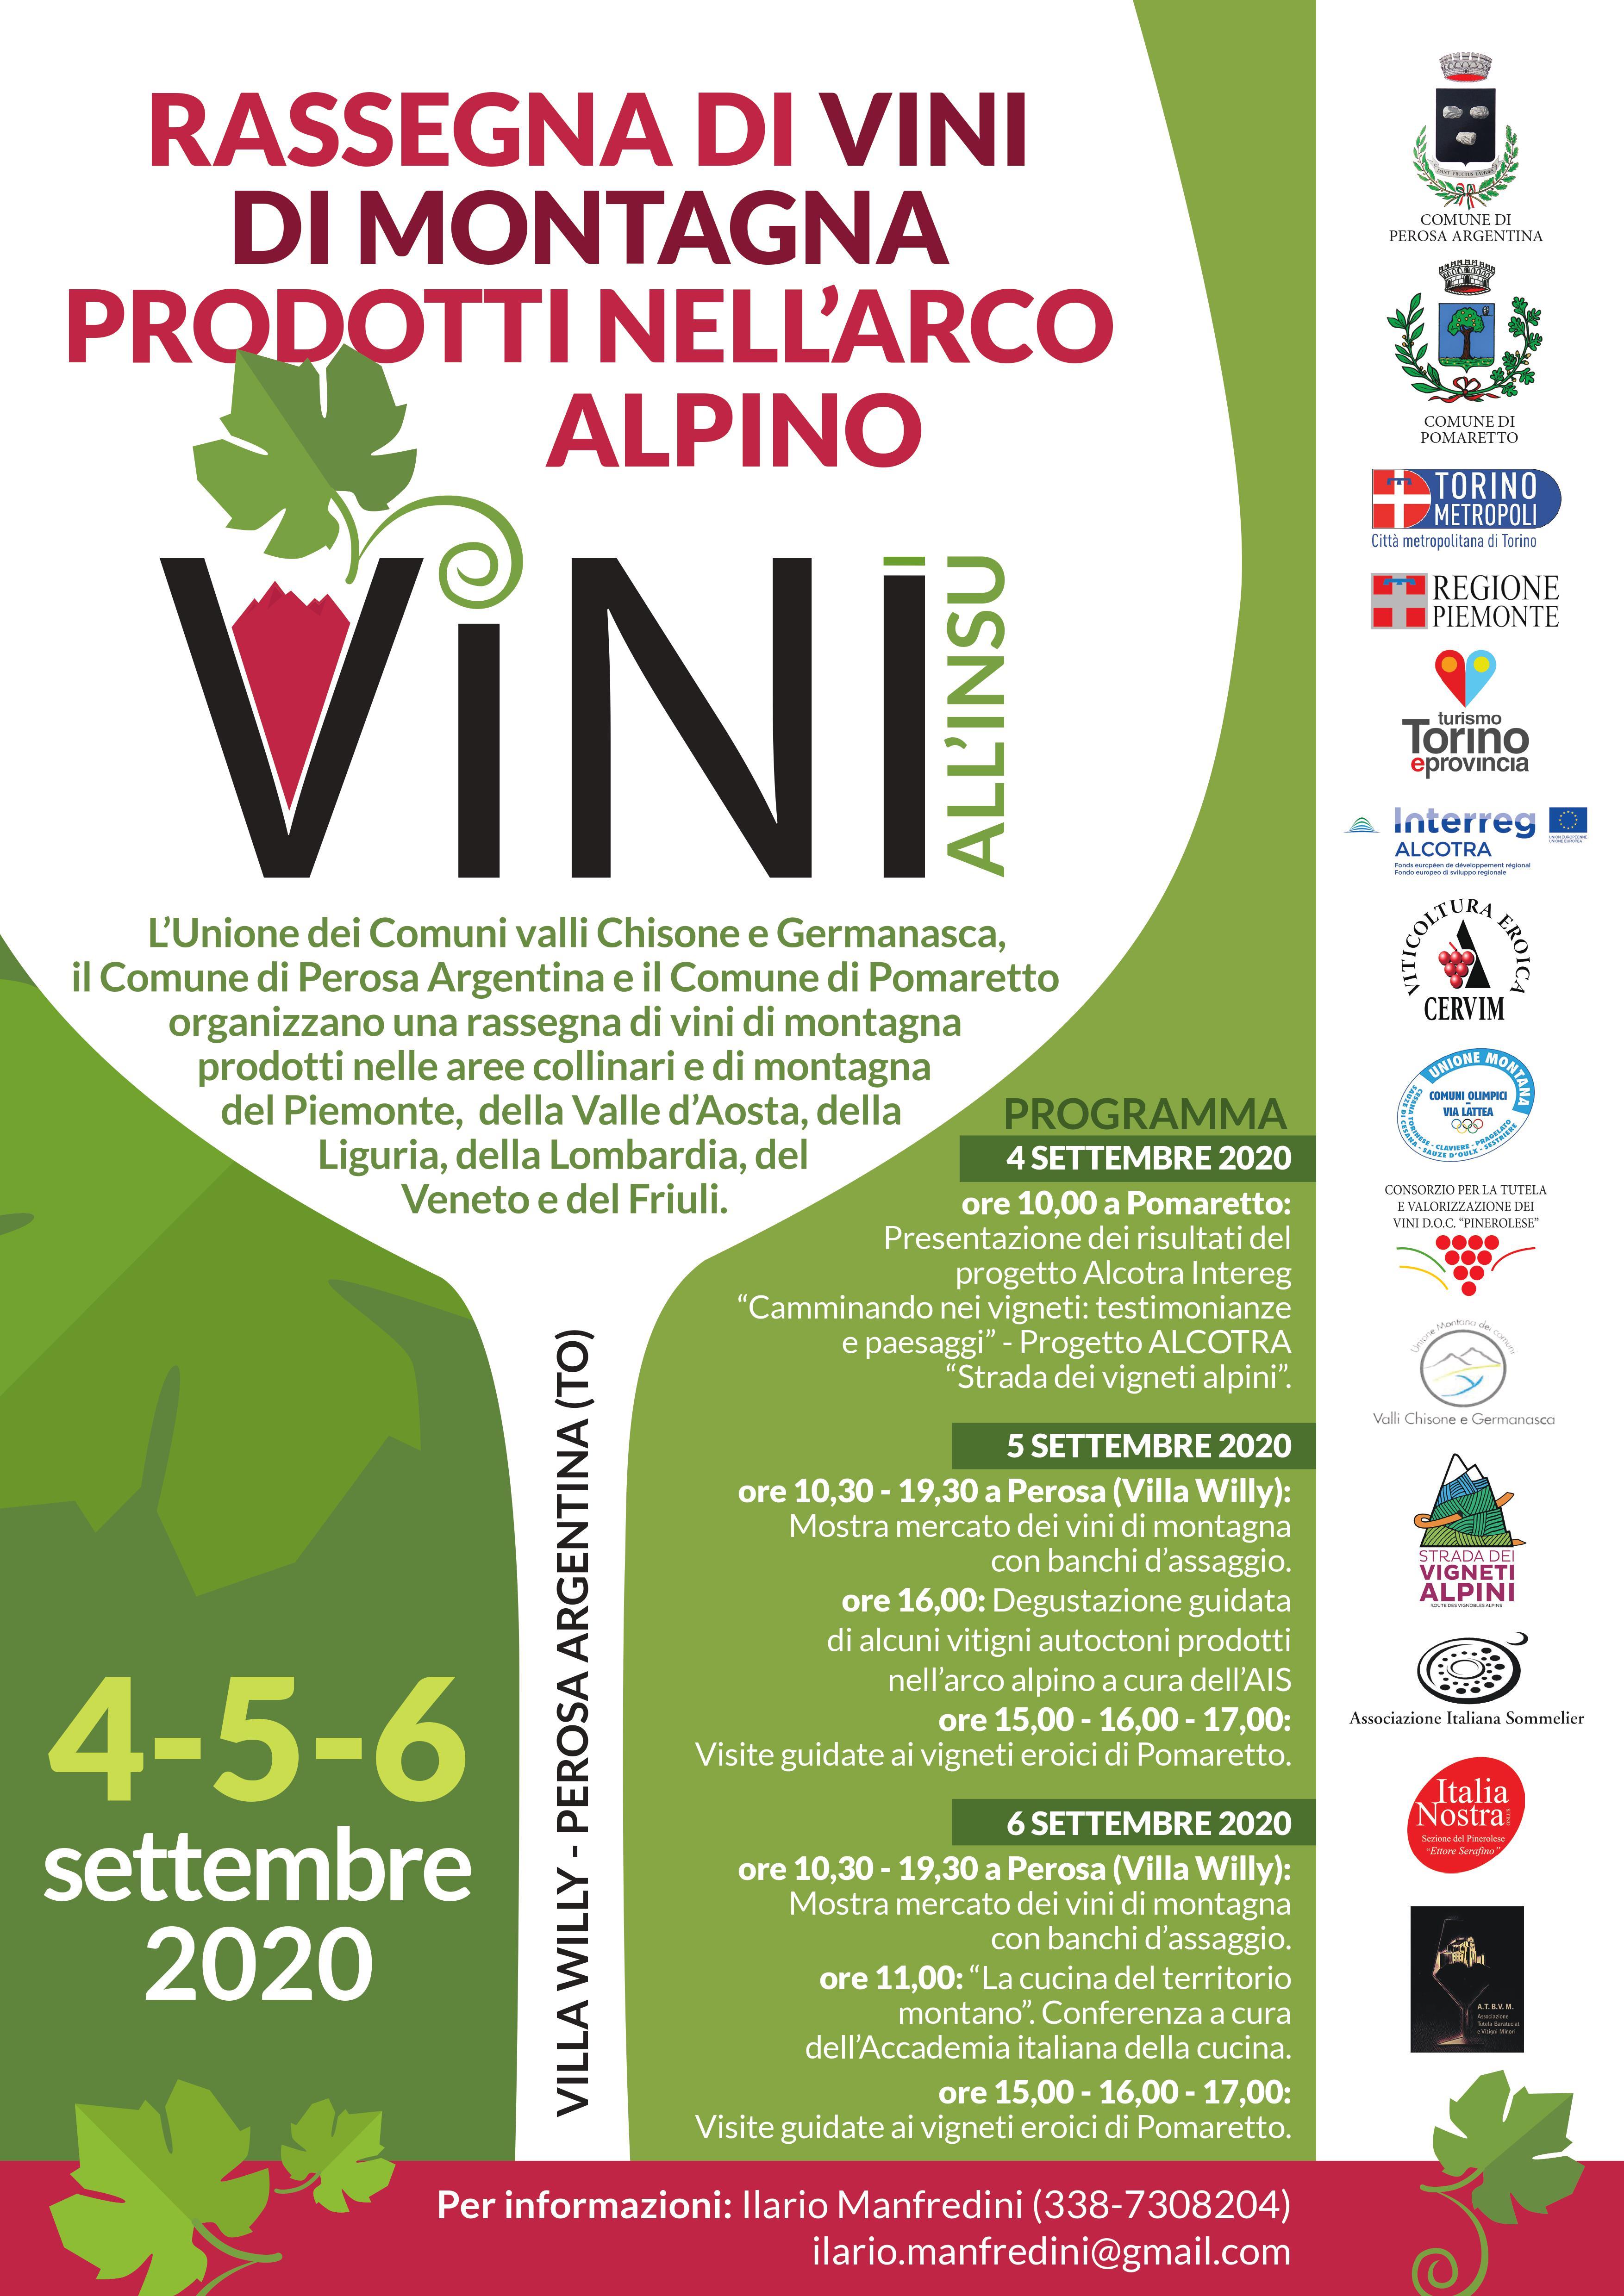 Vini_allinsu